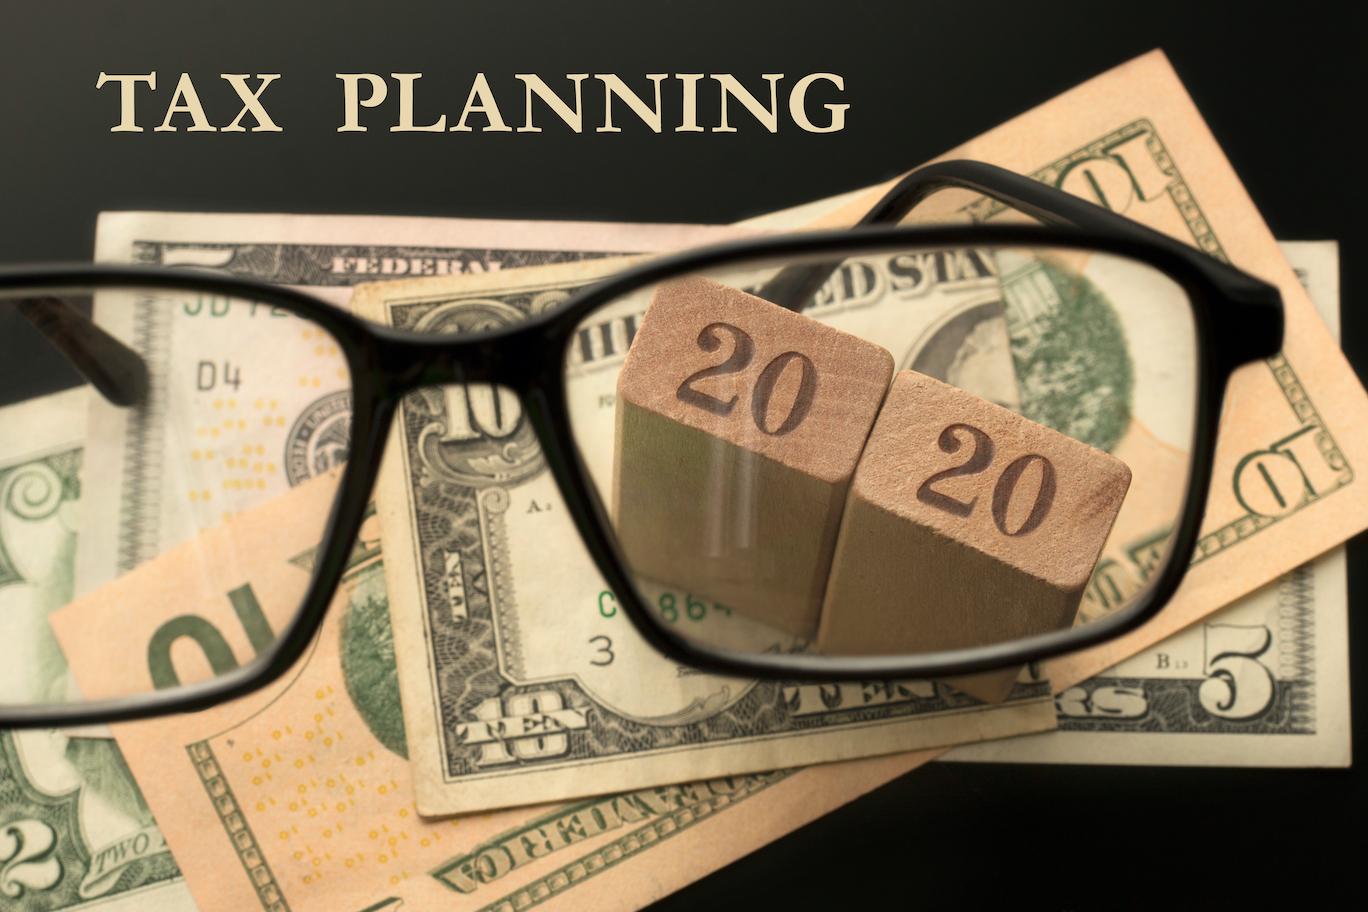 Tax Planning 2020